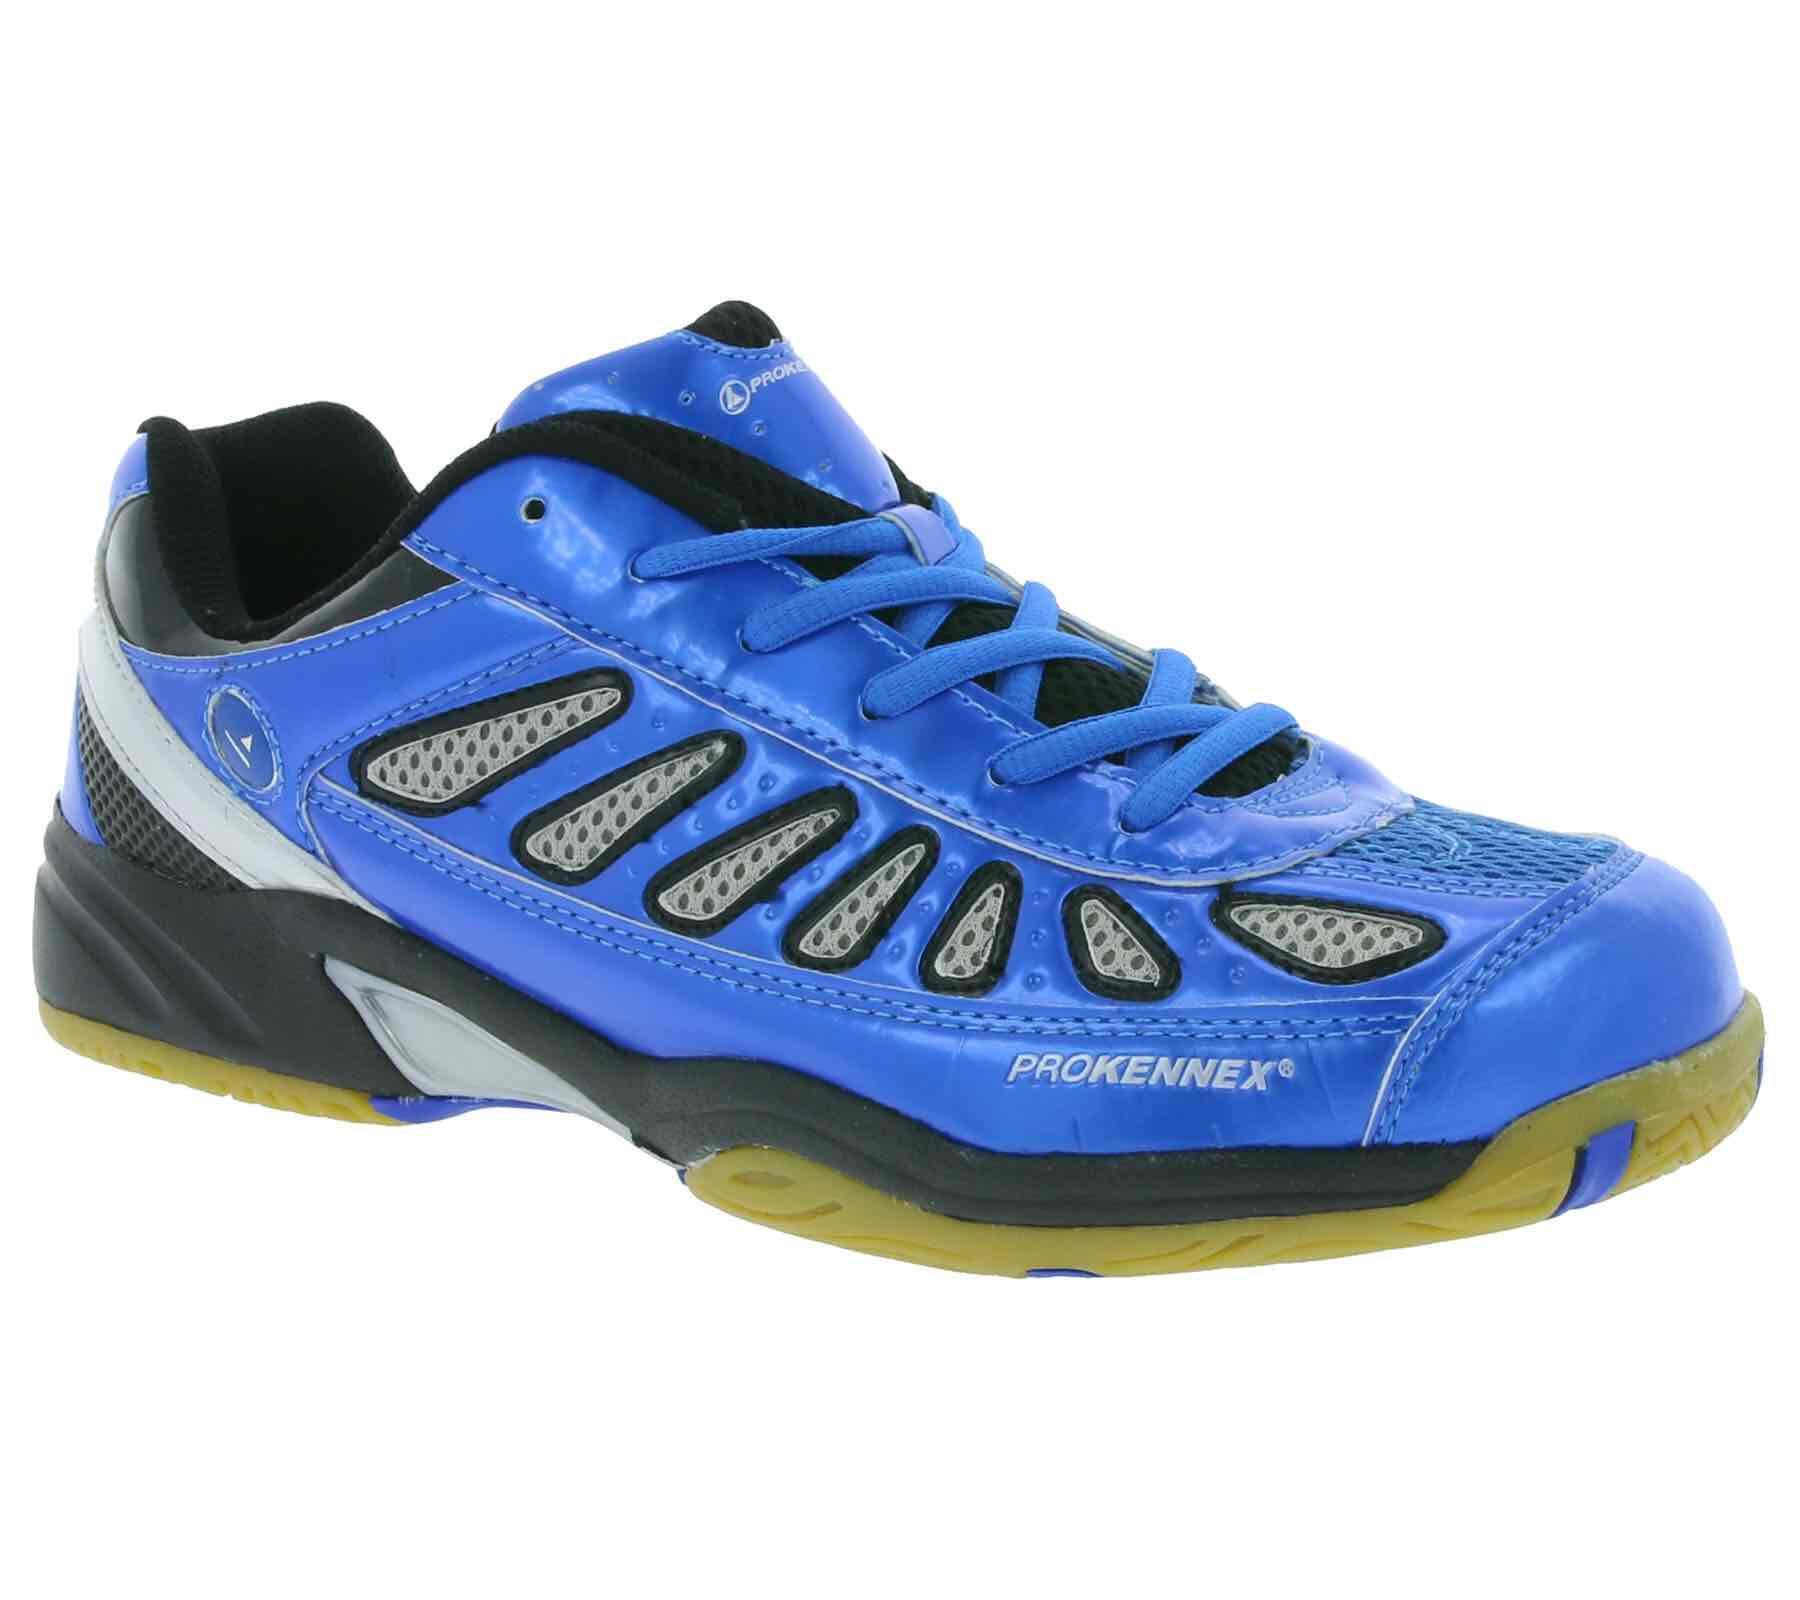 ProKennex Destiny Blue Herren Hallenschuhe Squash-Schuhe Blau